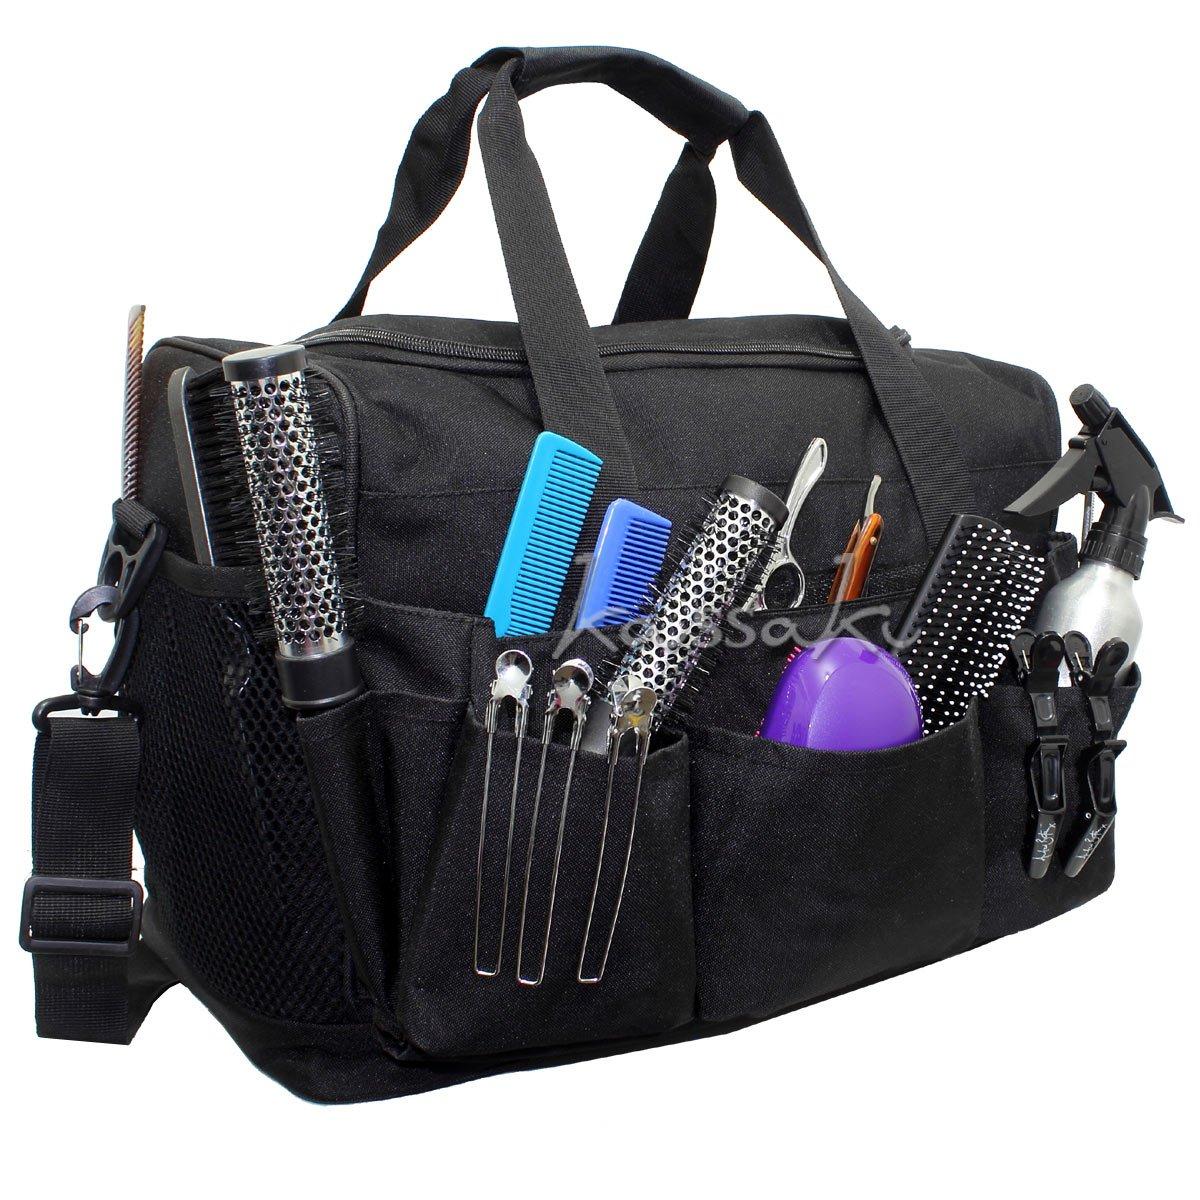 Hairdressing Designer Session Bag Large Mobile Hairdresser Barber Kit Holder in Black Kassaki